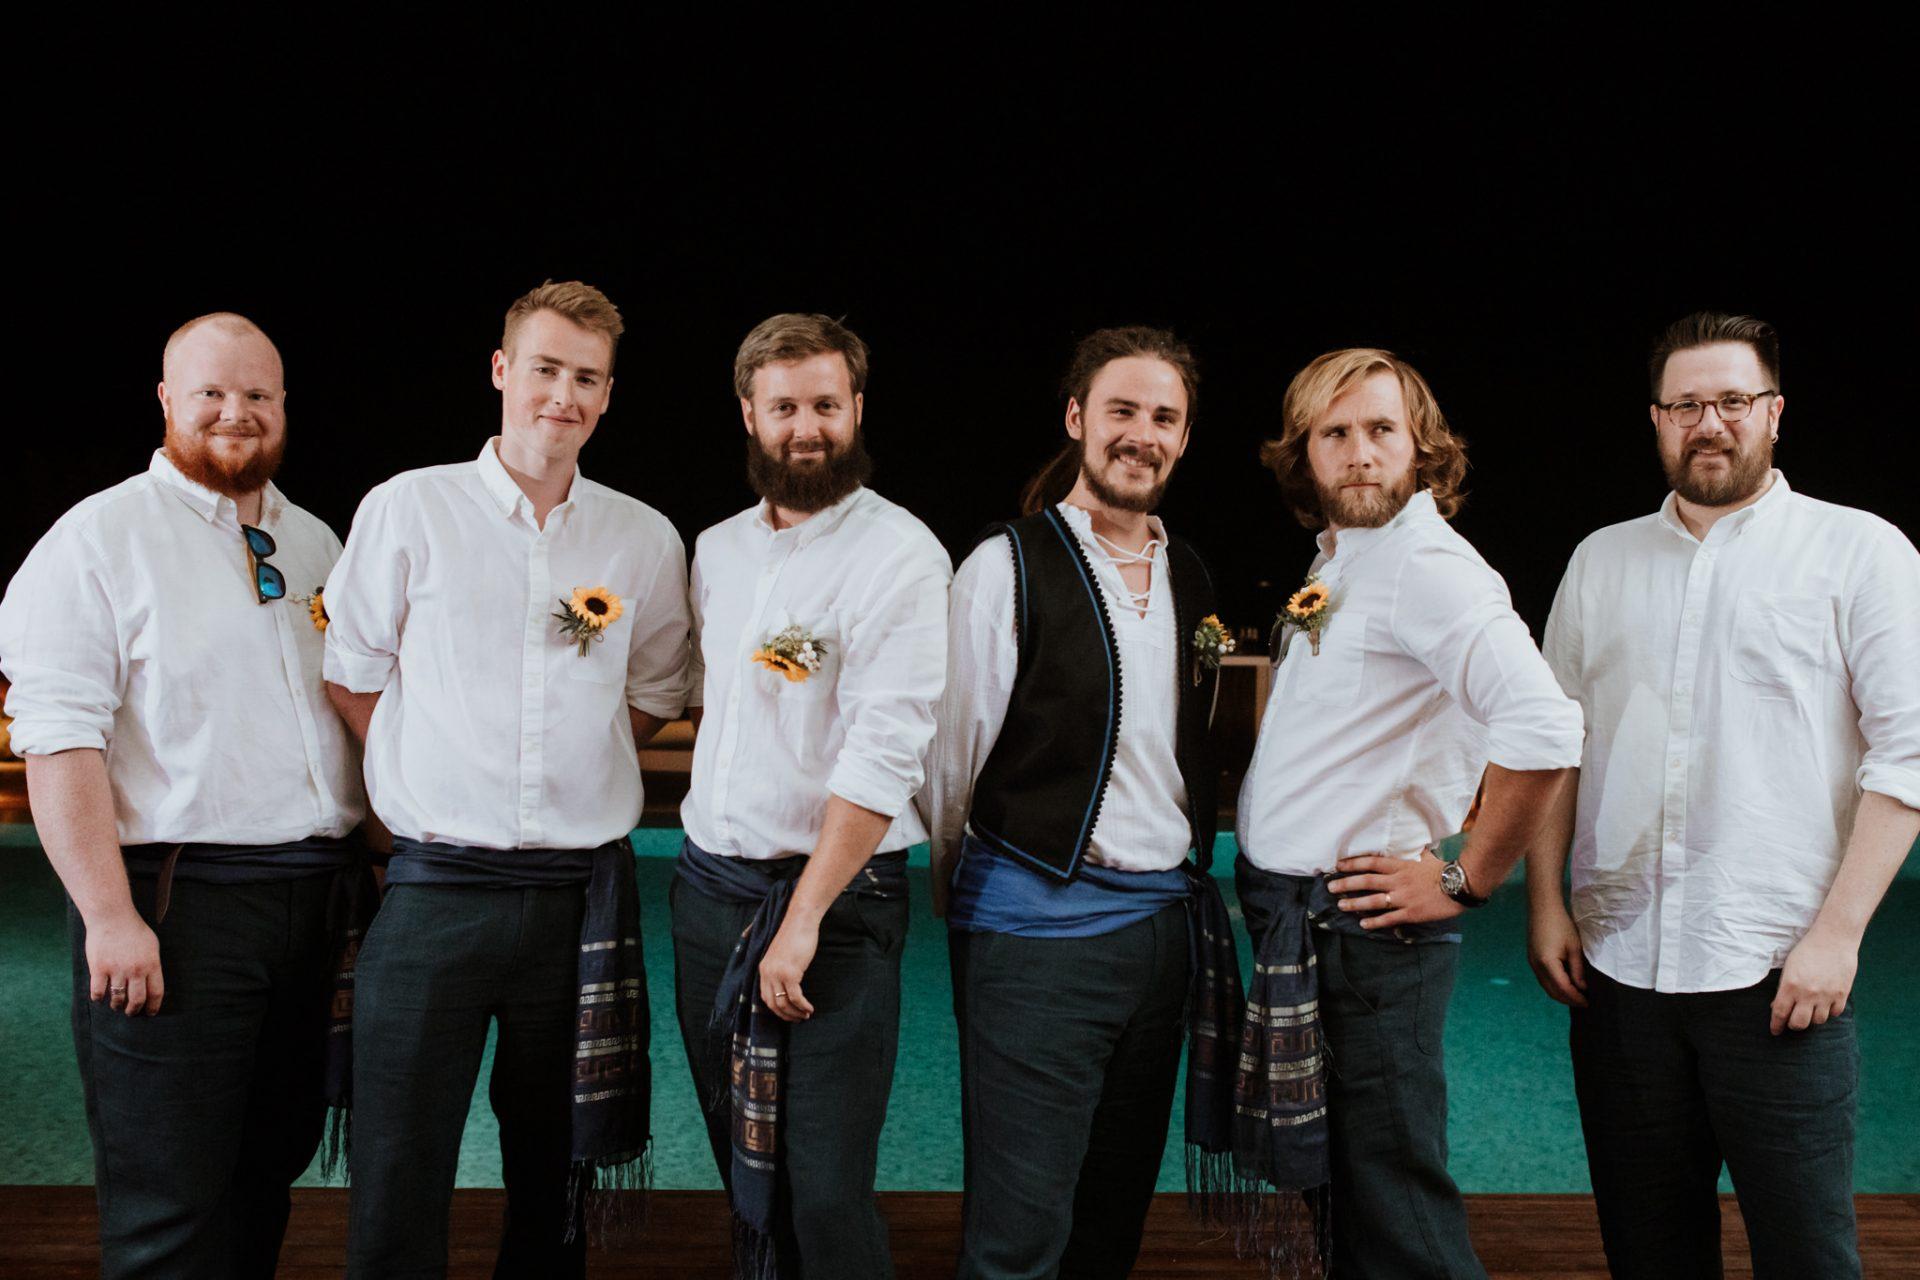 group photo groom and groomsmen